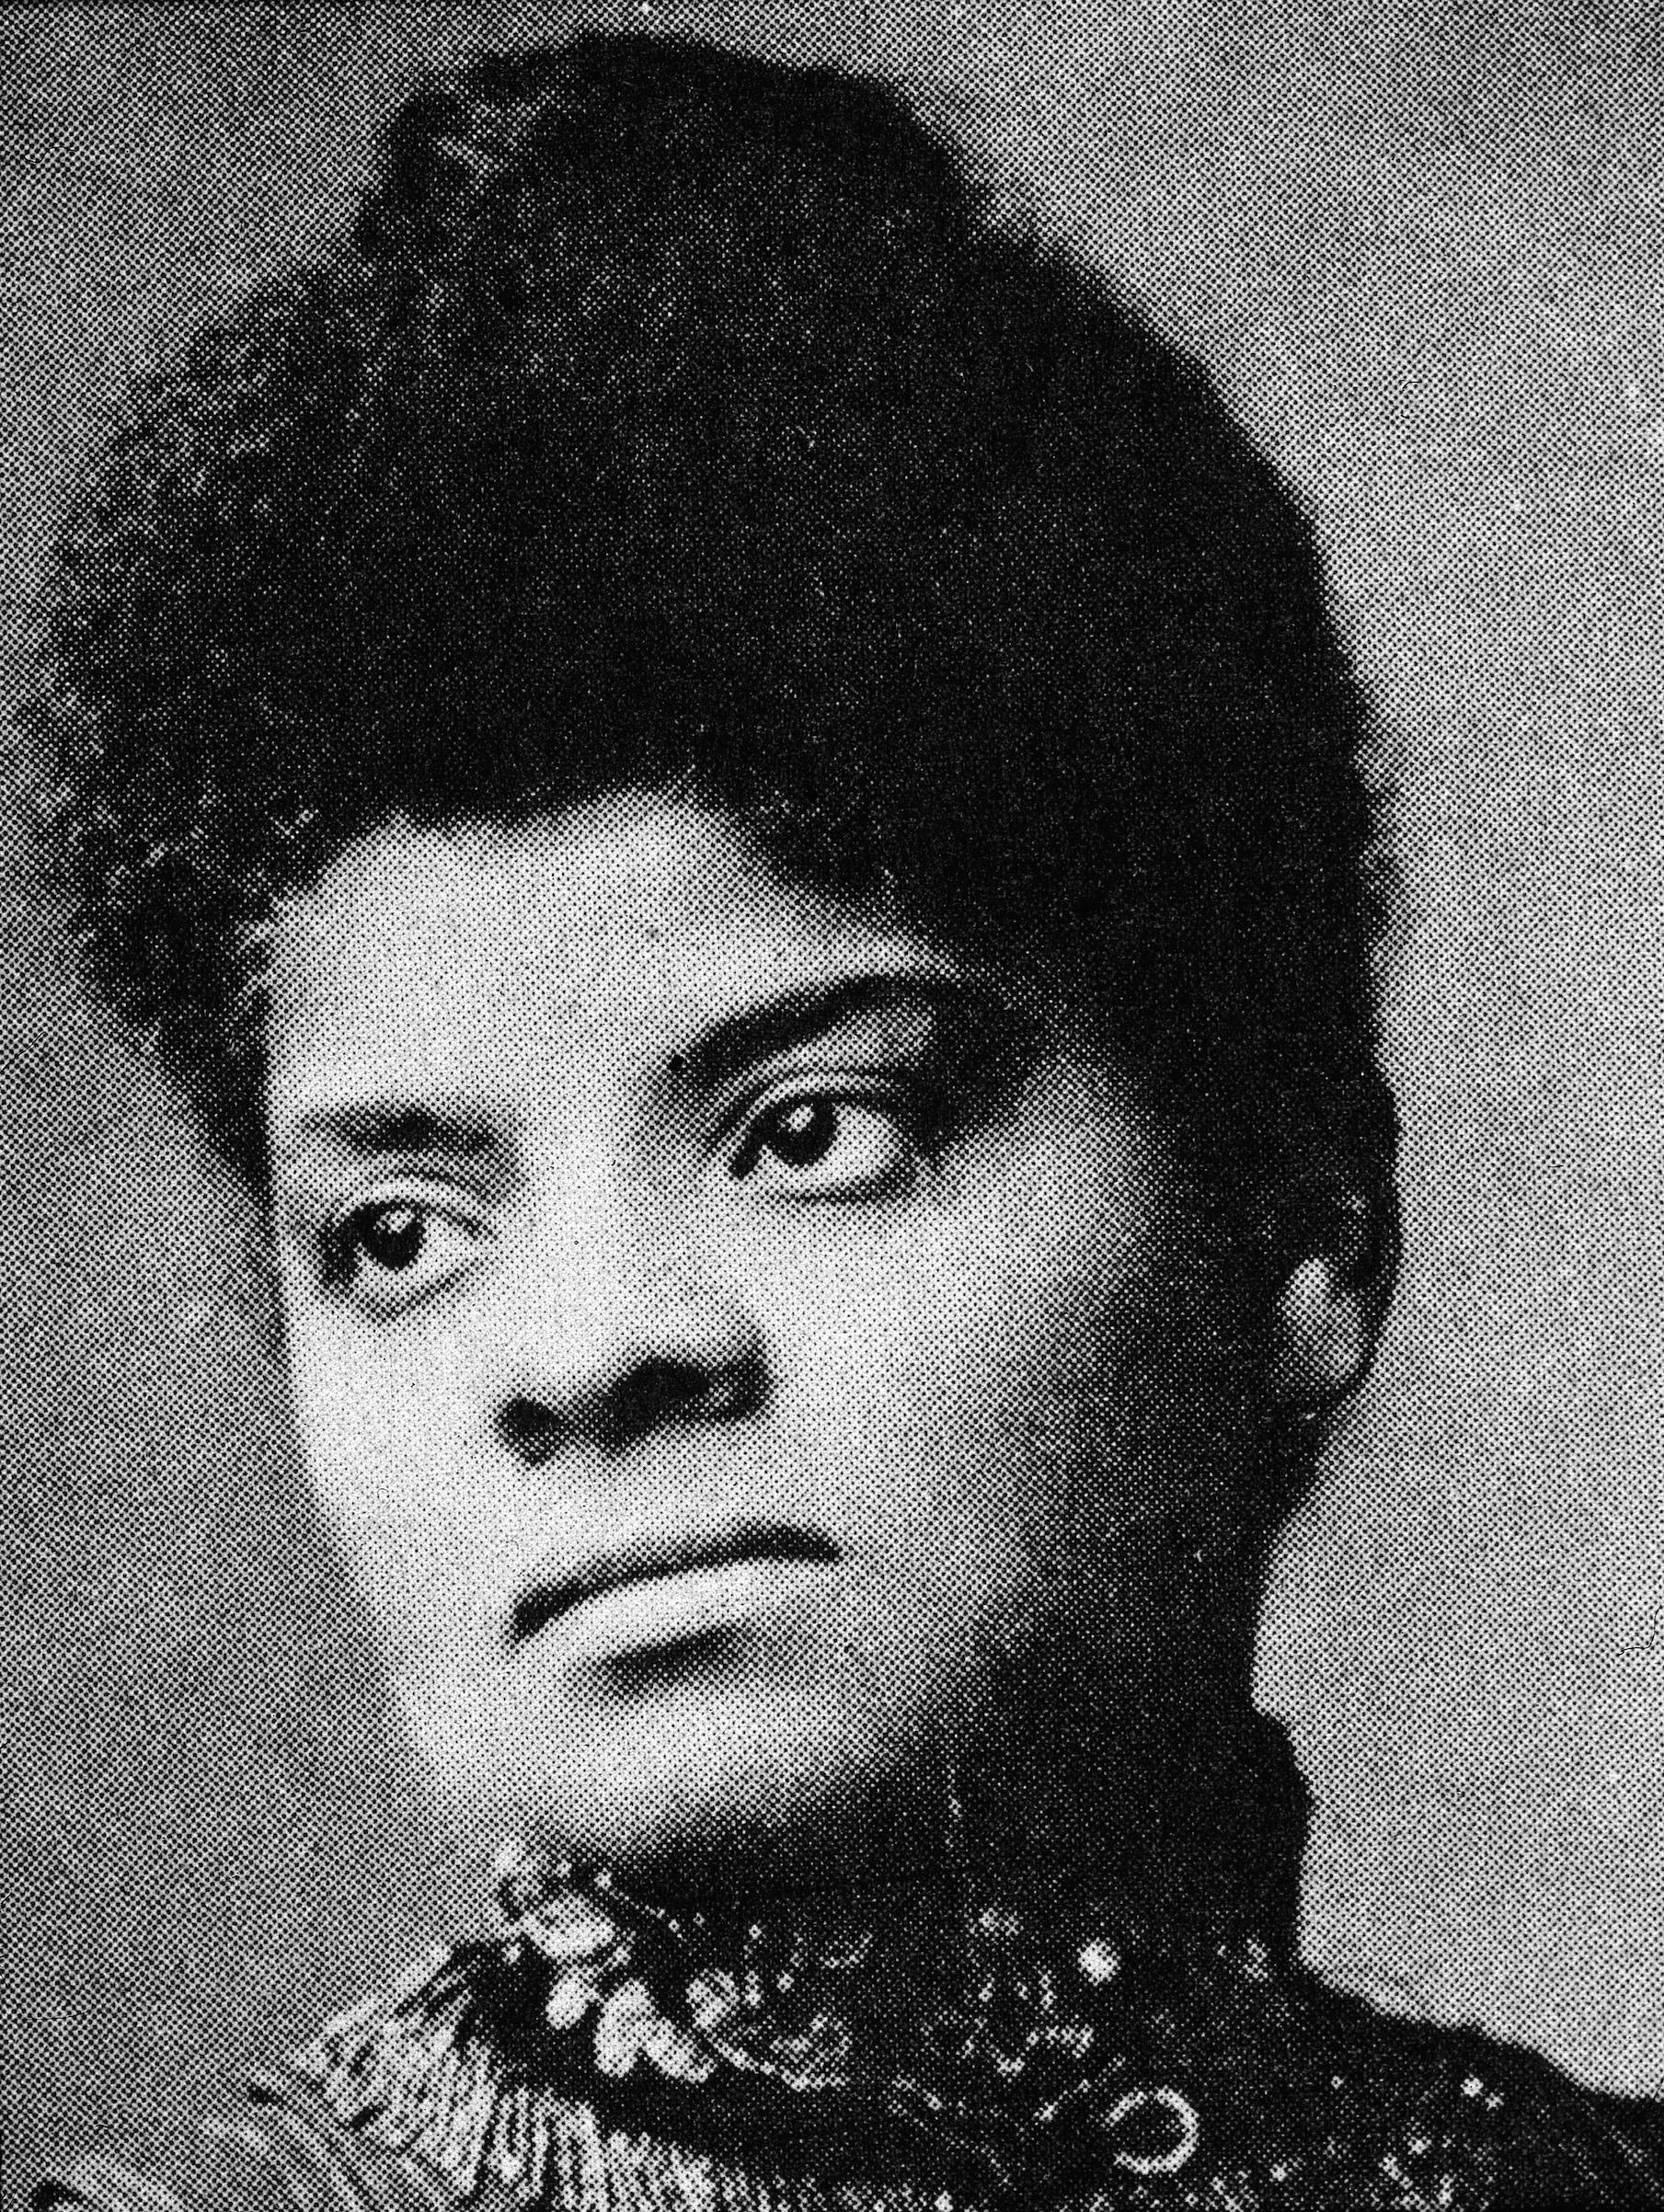 Portrait of American journalist, suffragist and Progressive activist Ida Wells Barnett (1862 - 1931), 1890s. African American history facts